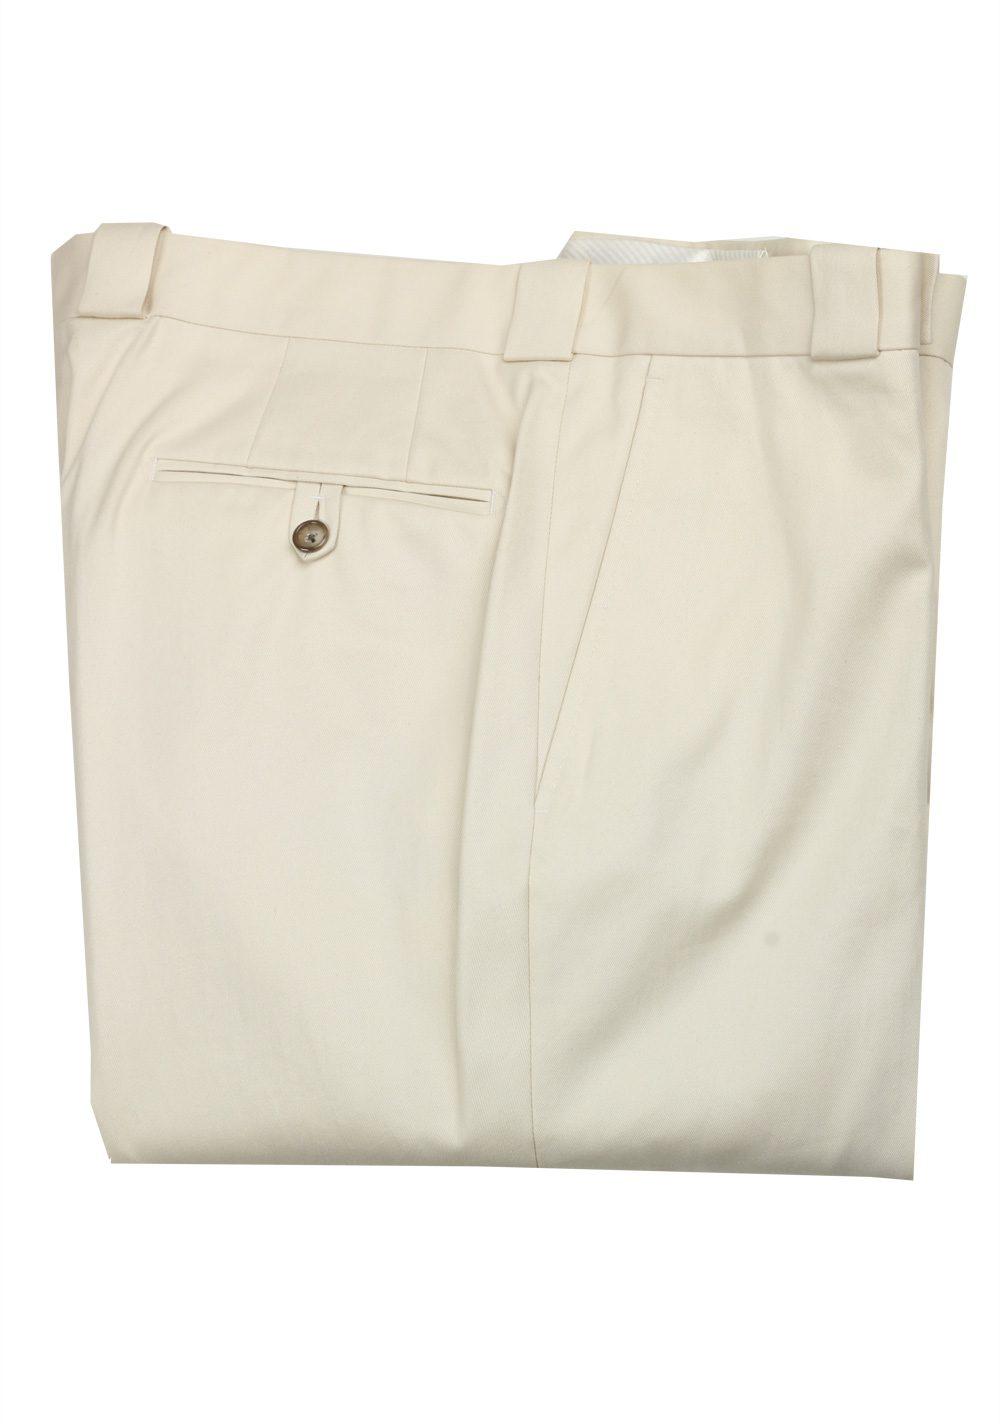 TOM FORD Beige Cotton Trousers Size 56 / 40 U.S. | Costume Limité